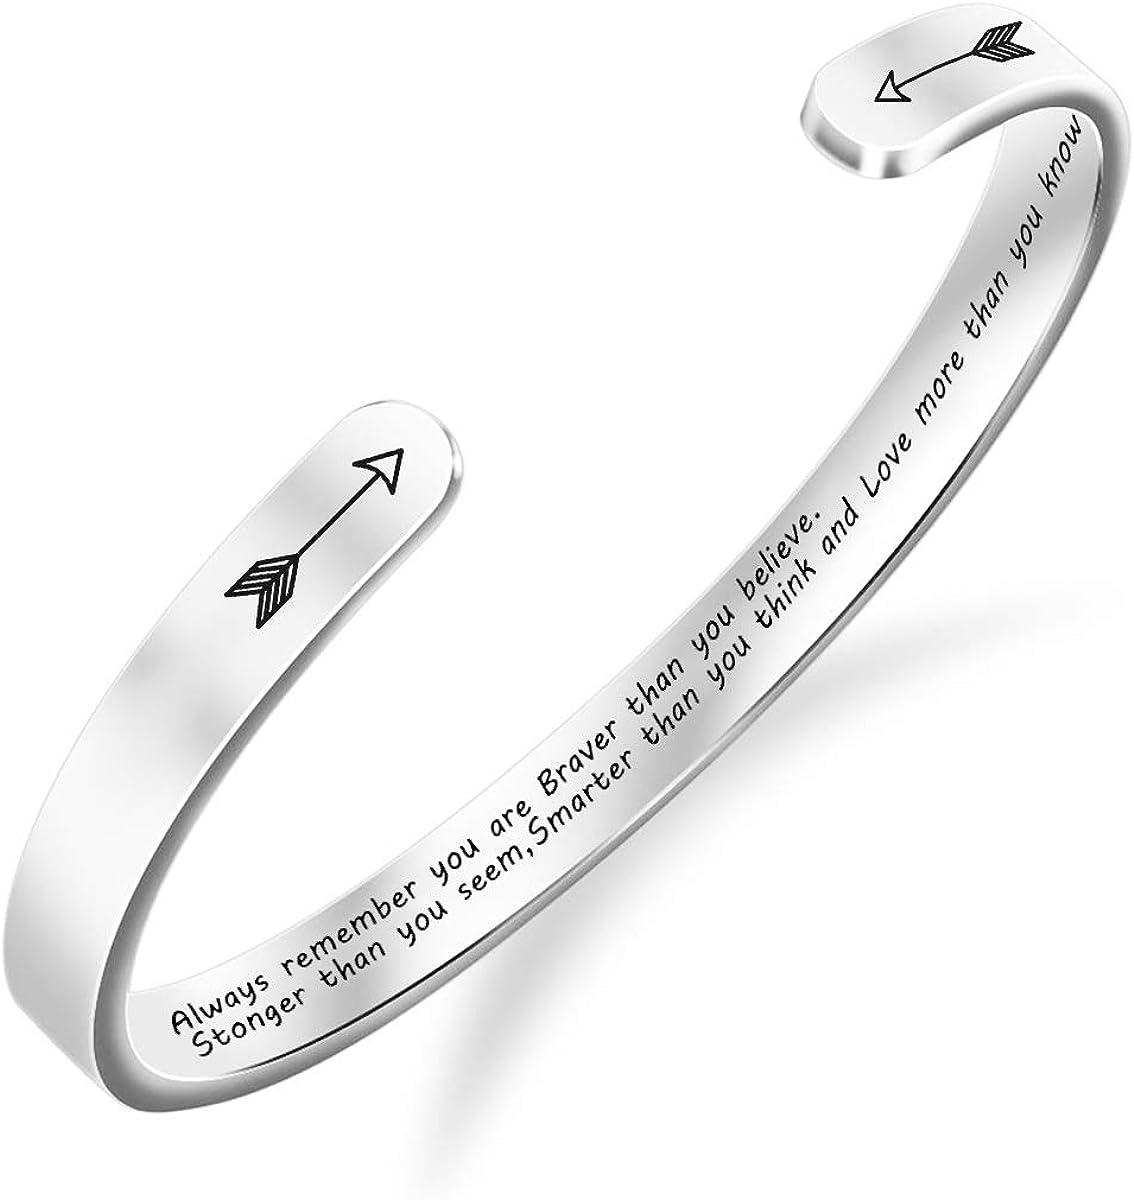 BFJLIFE Inspirational Cuff Bangle Bracelets for Women Girls Stainless Steel Jewelry